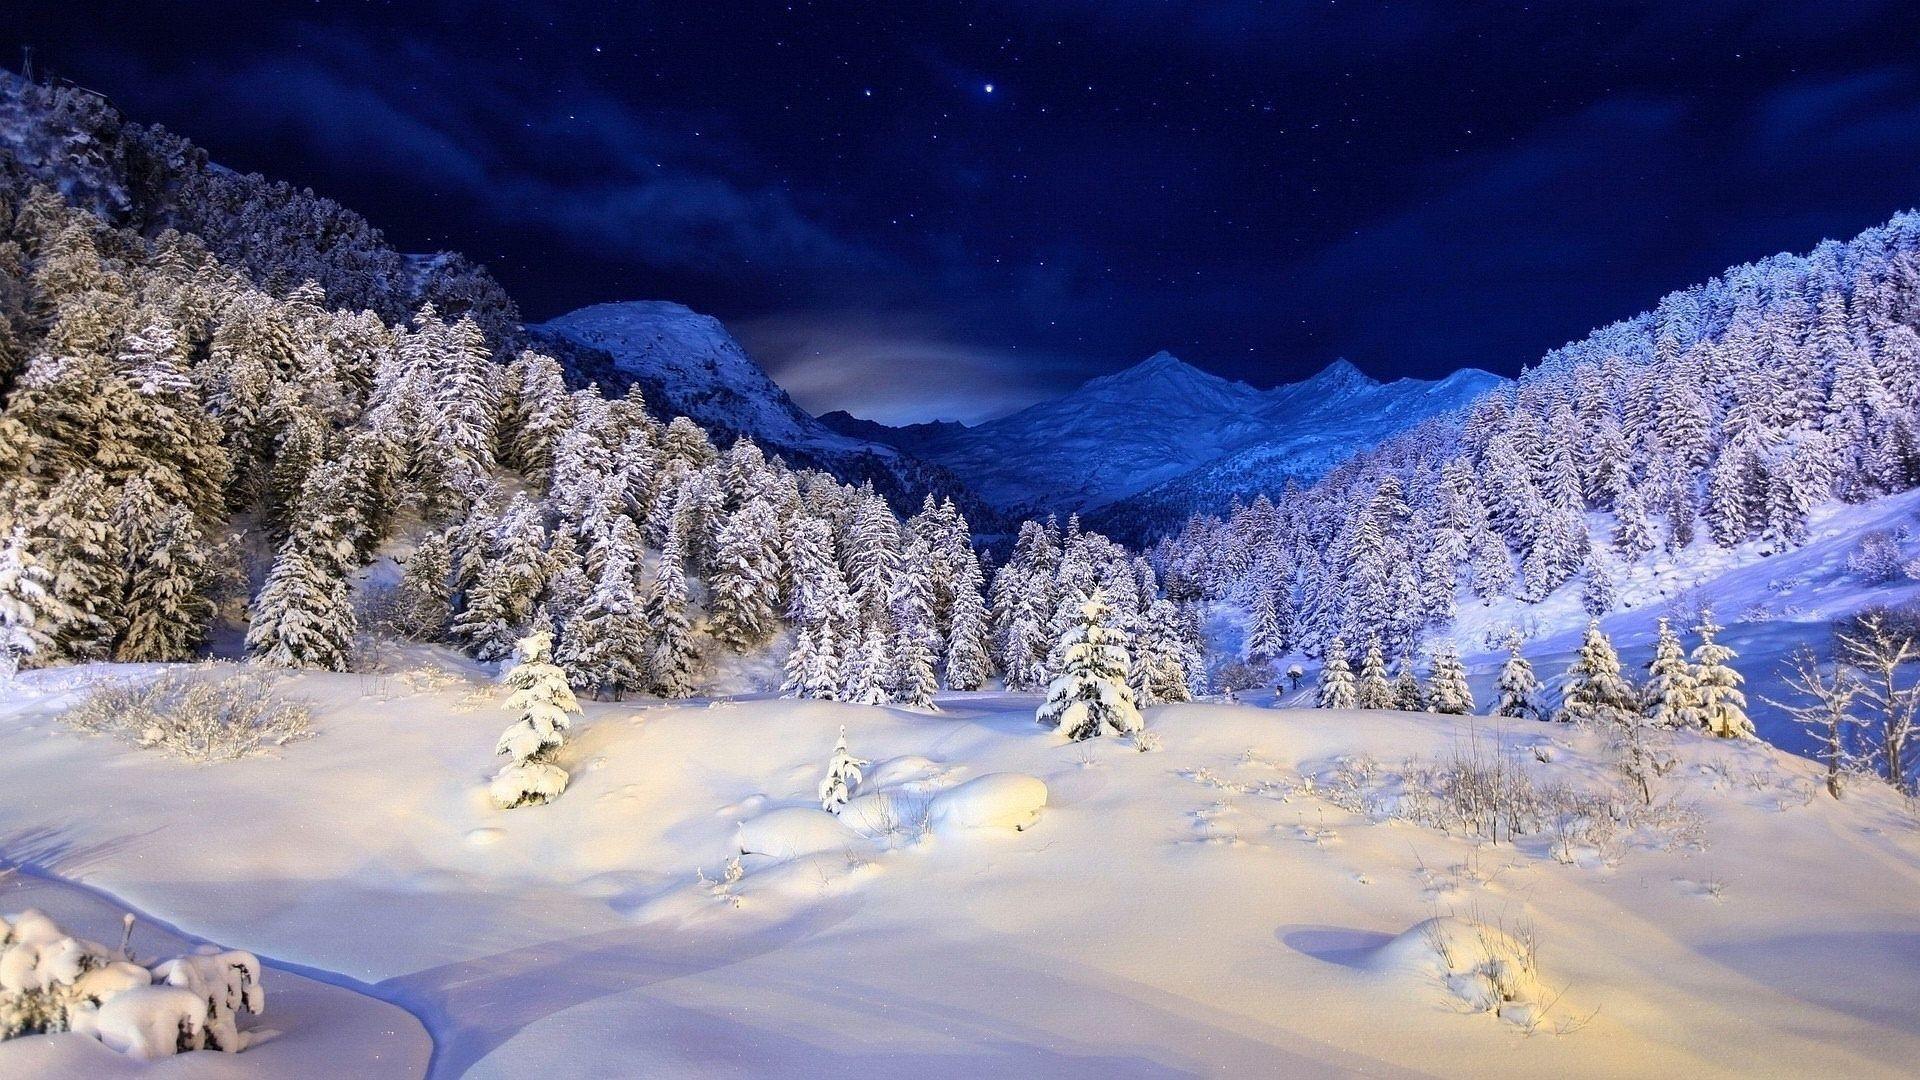 Night Winter Mountain Scenes